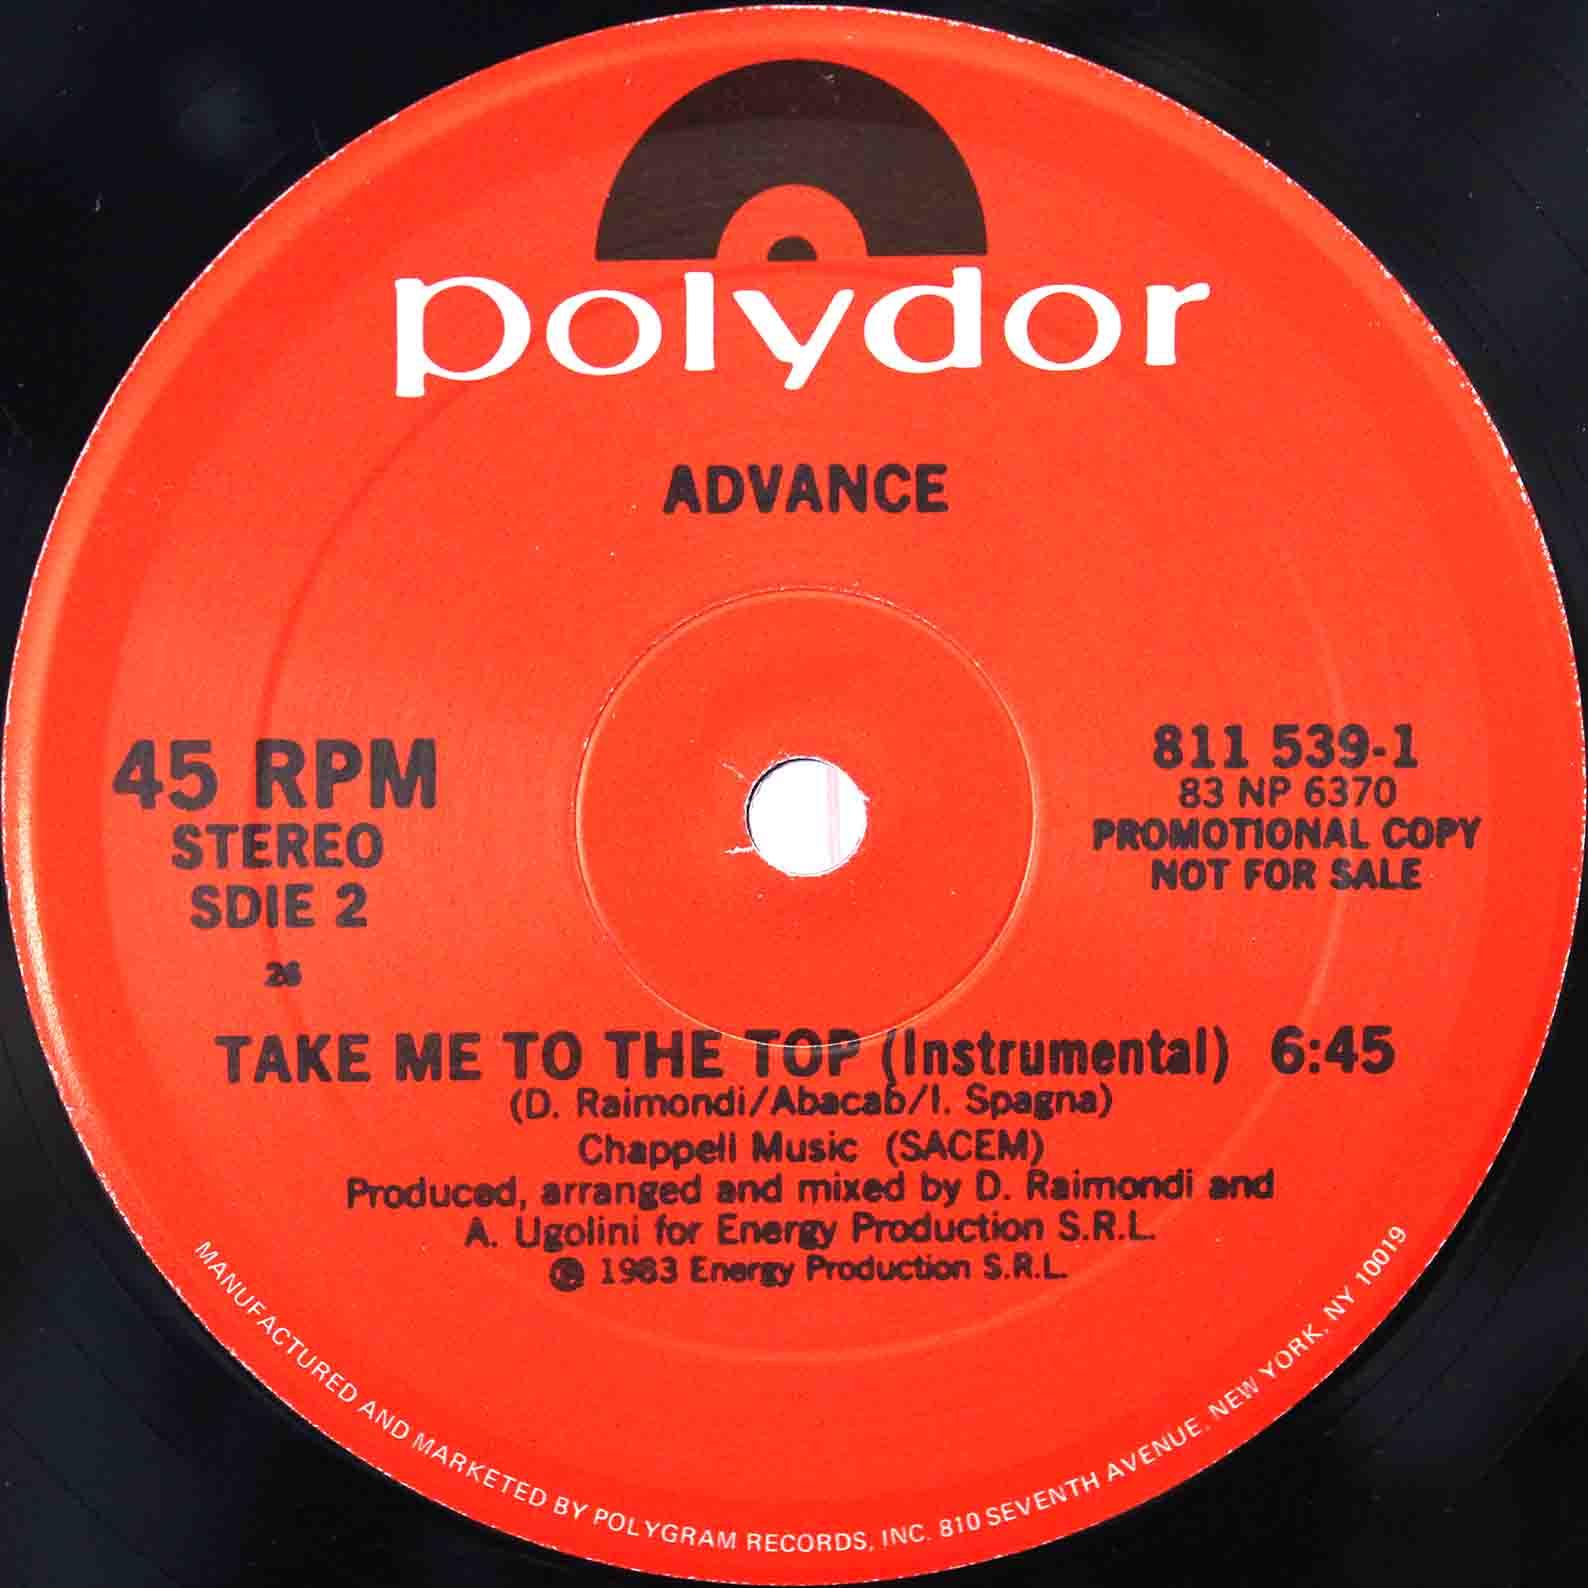 Advance – Take Me To The Top 04